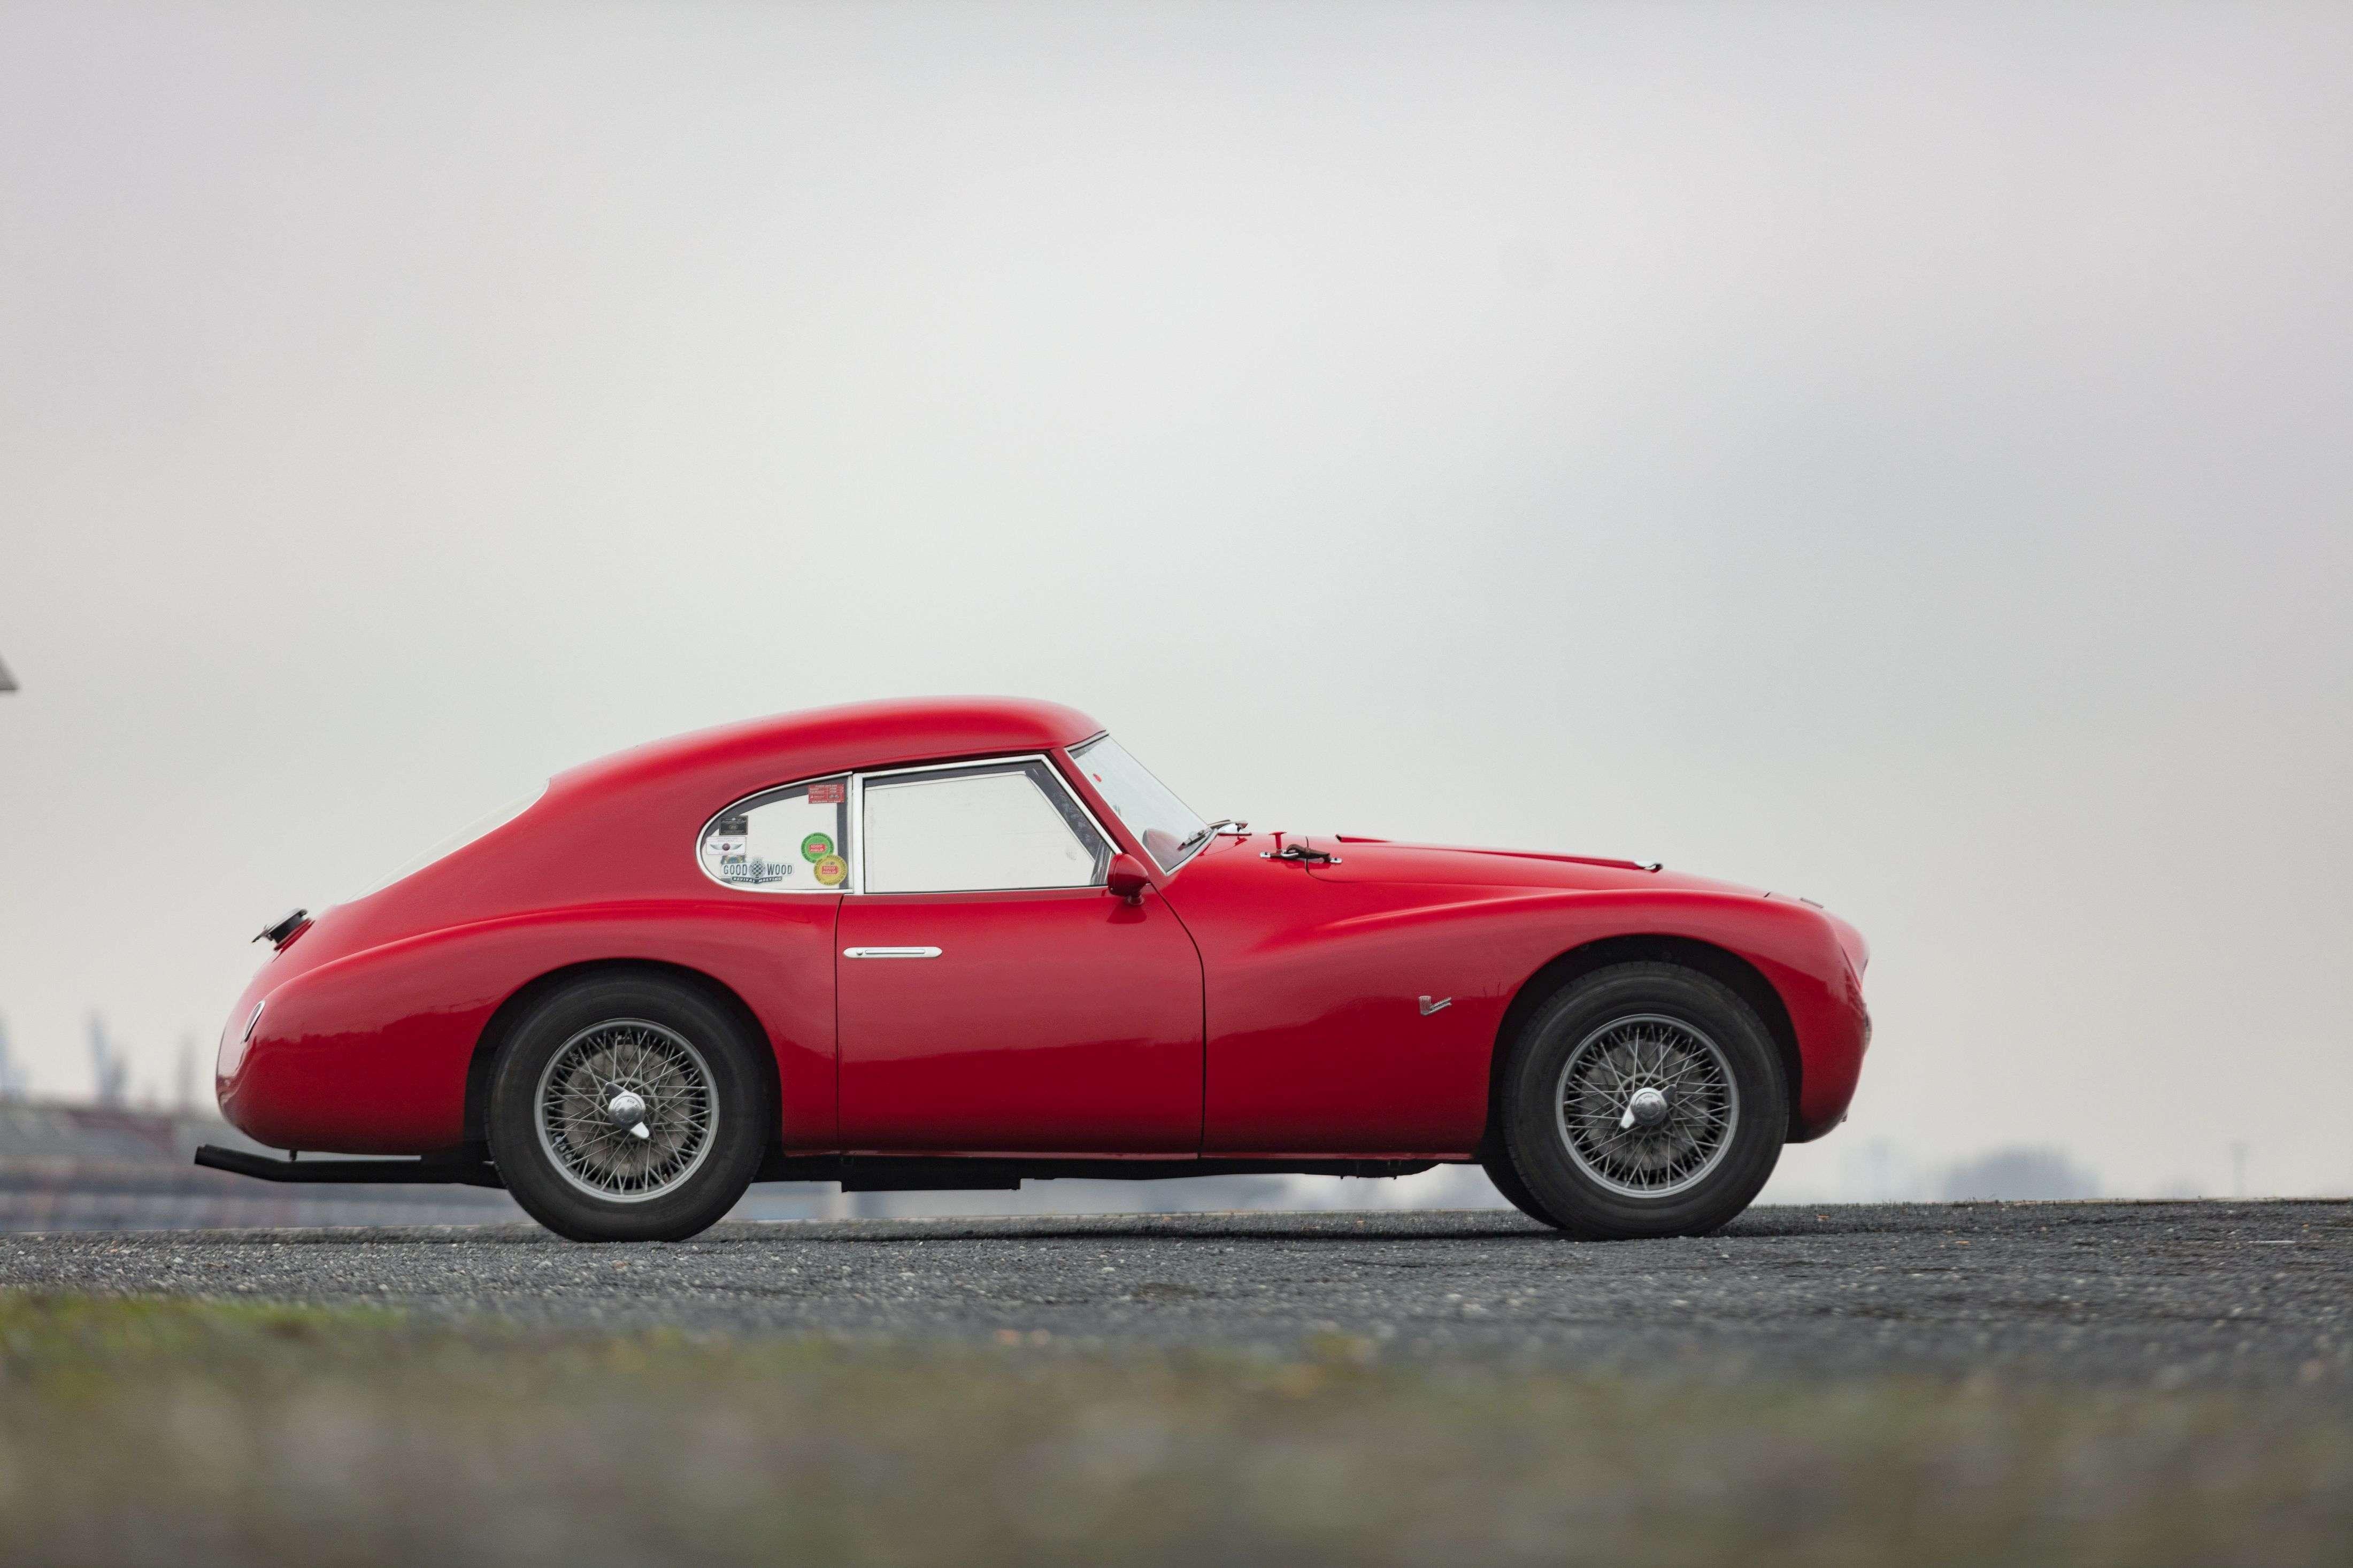 Rare 1953 Fiat 8V leads Artcurial October Auction